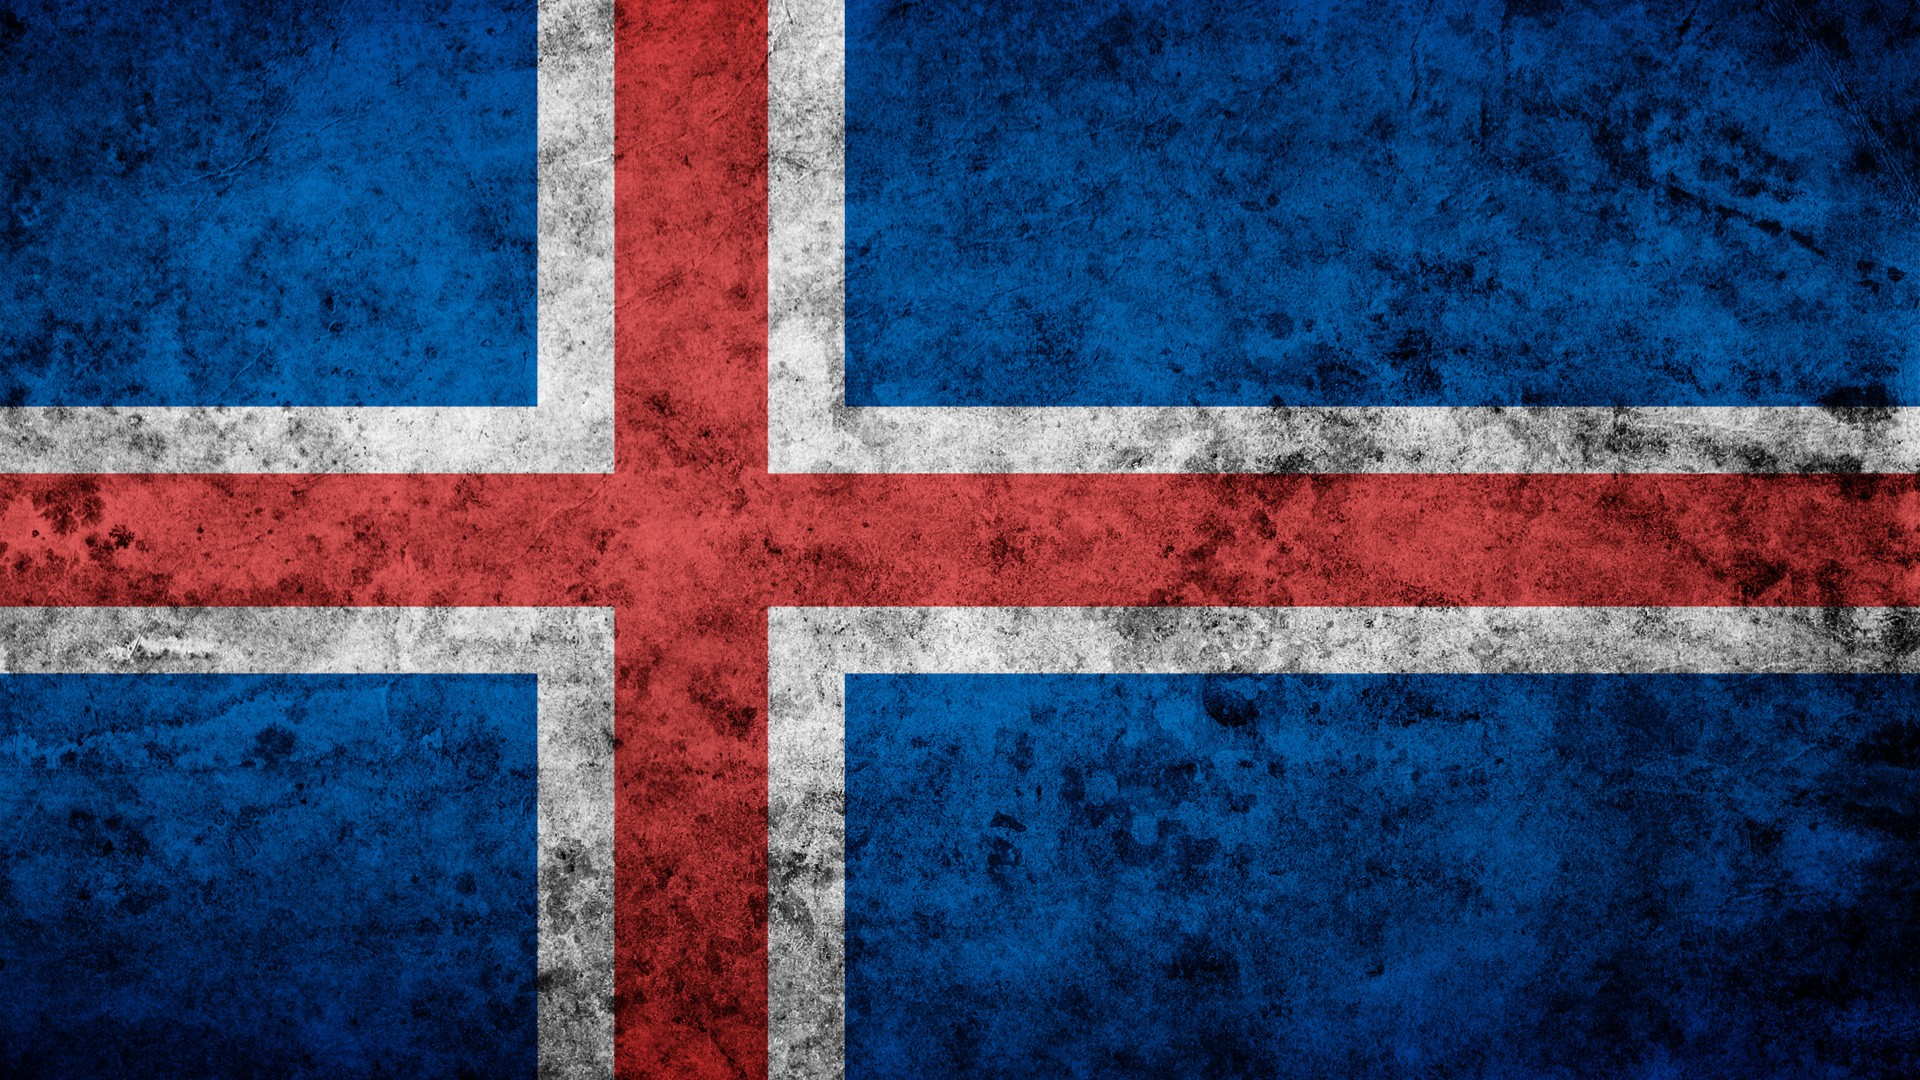 Grunge flags Iceland artwork wallpaper | 1920x1080 | 191962 ...